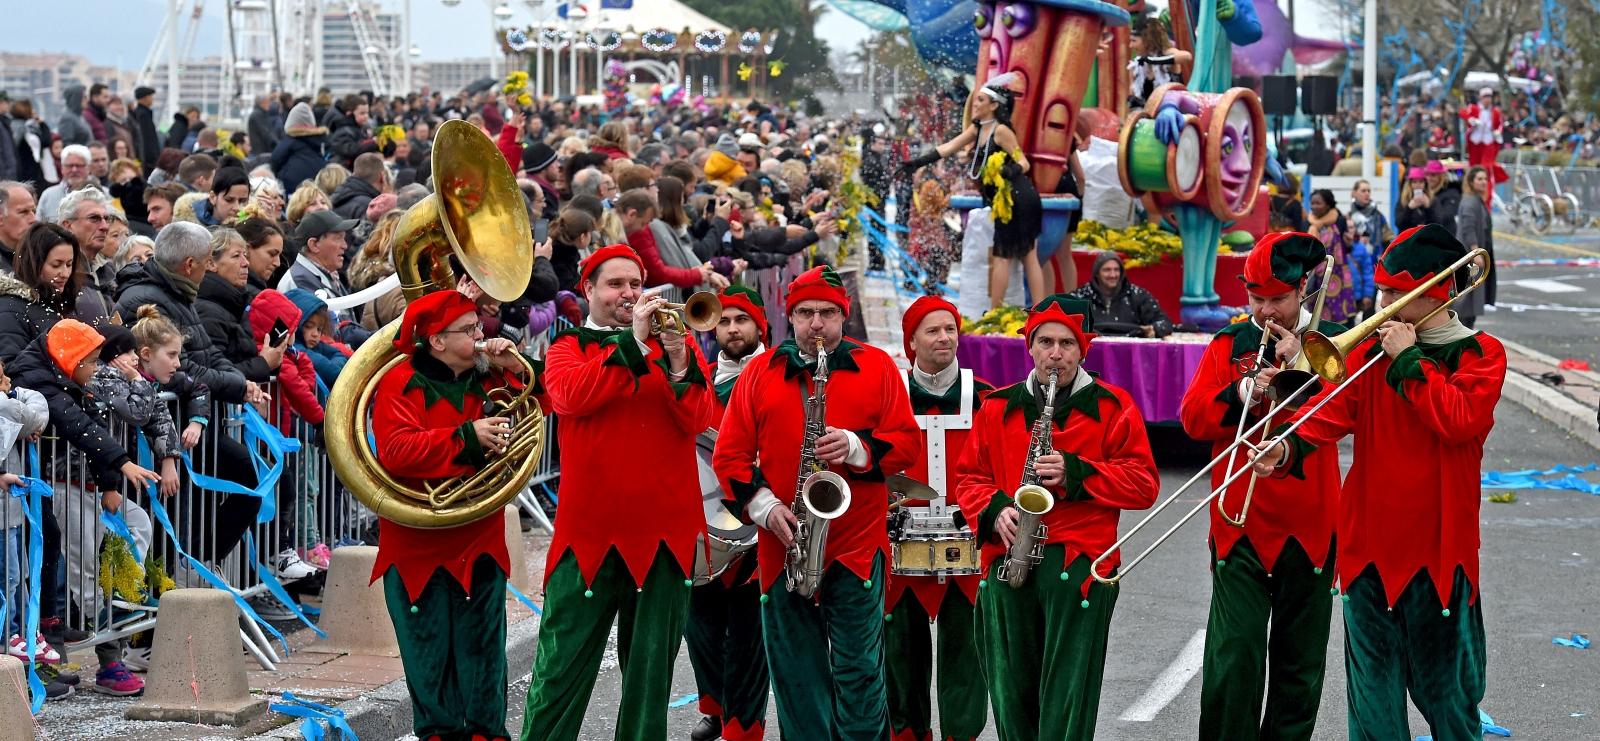 Groupe-Journee-Carnaval-SR